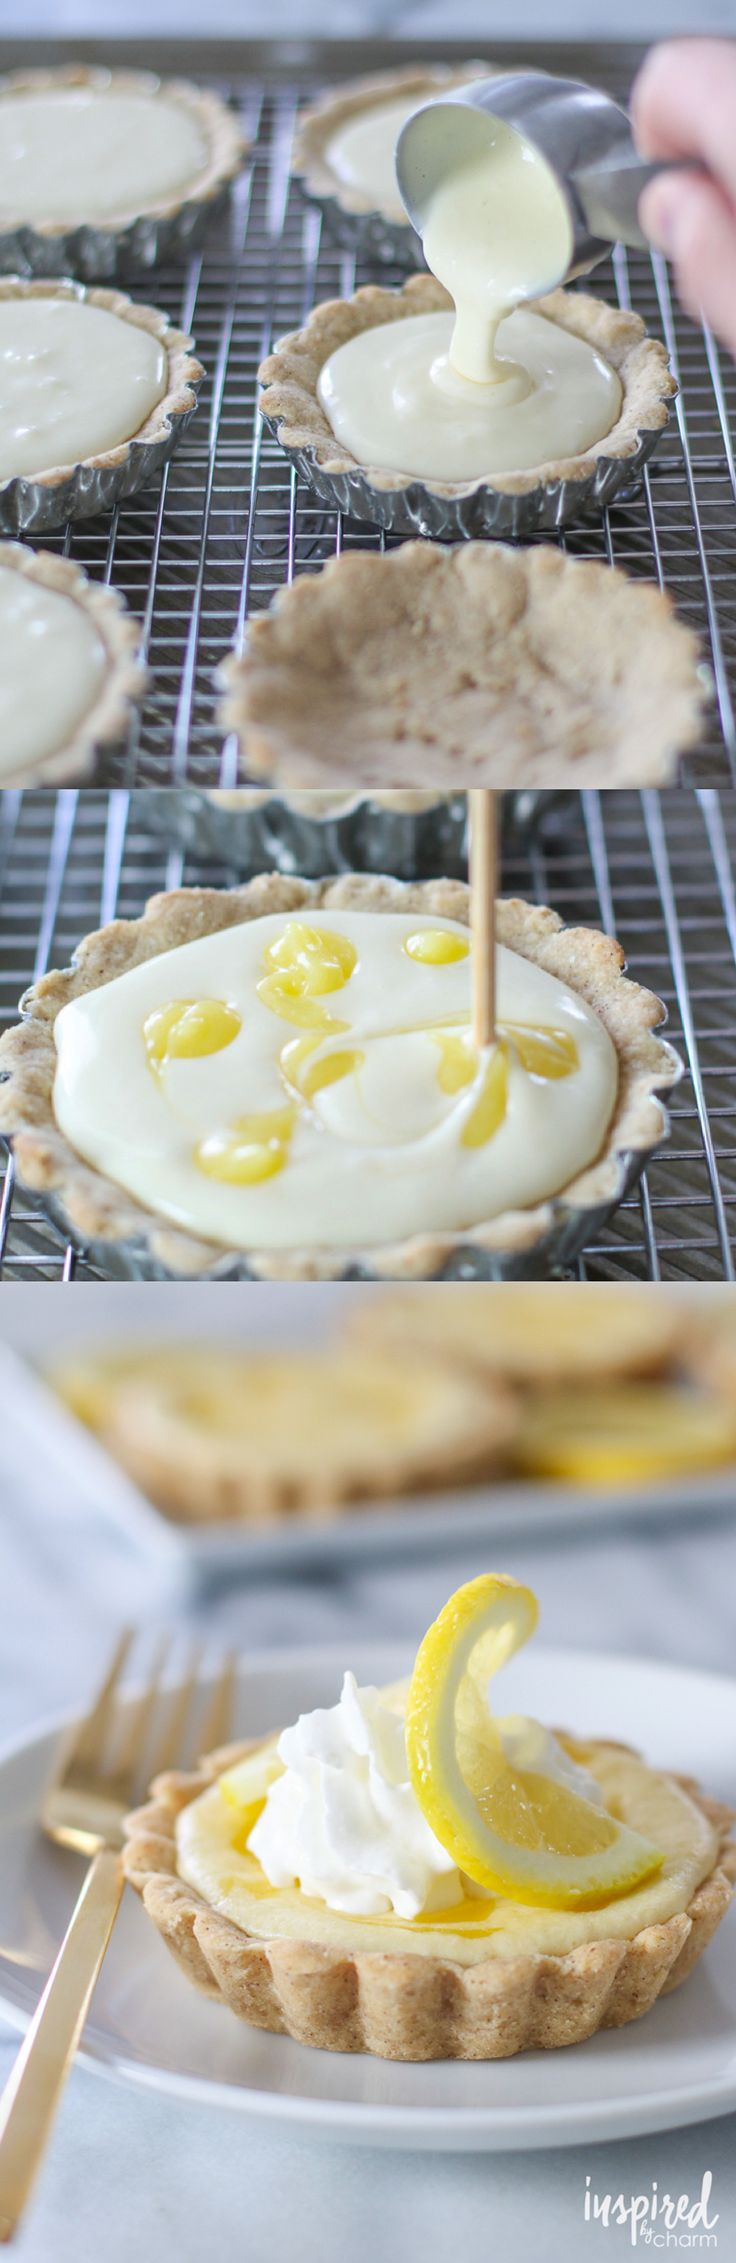 Lemon Curd Cheesecake Tarts - spring dessert recipe, lemon dessert ideas